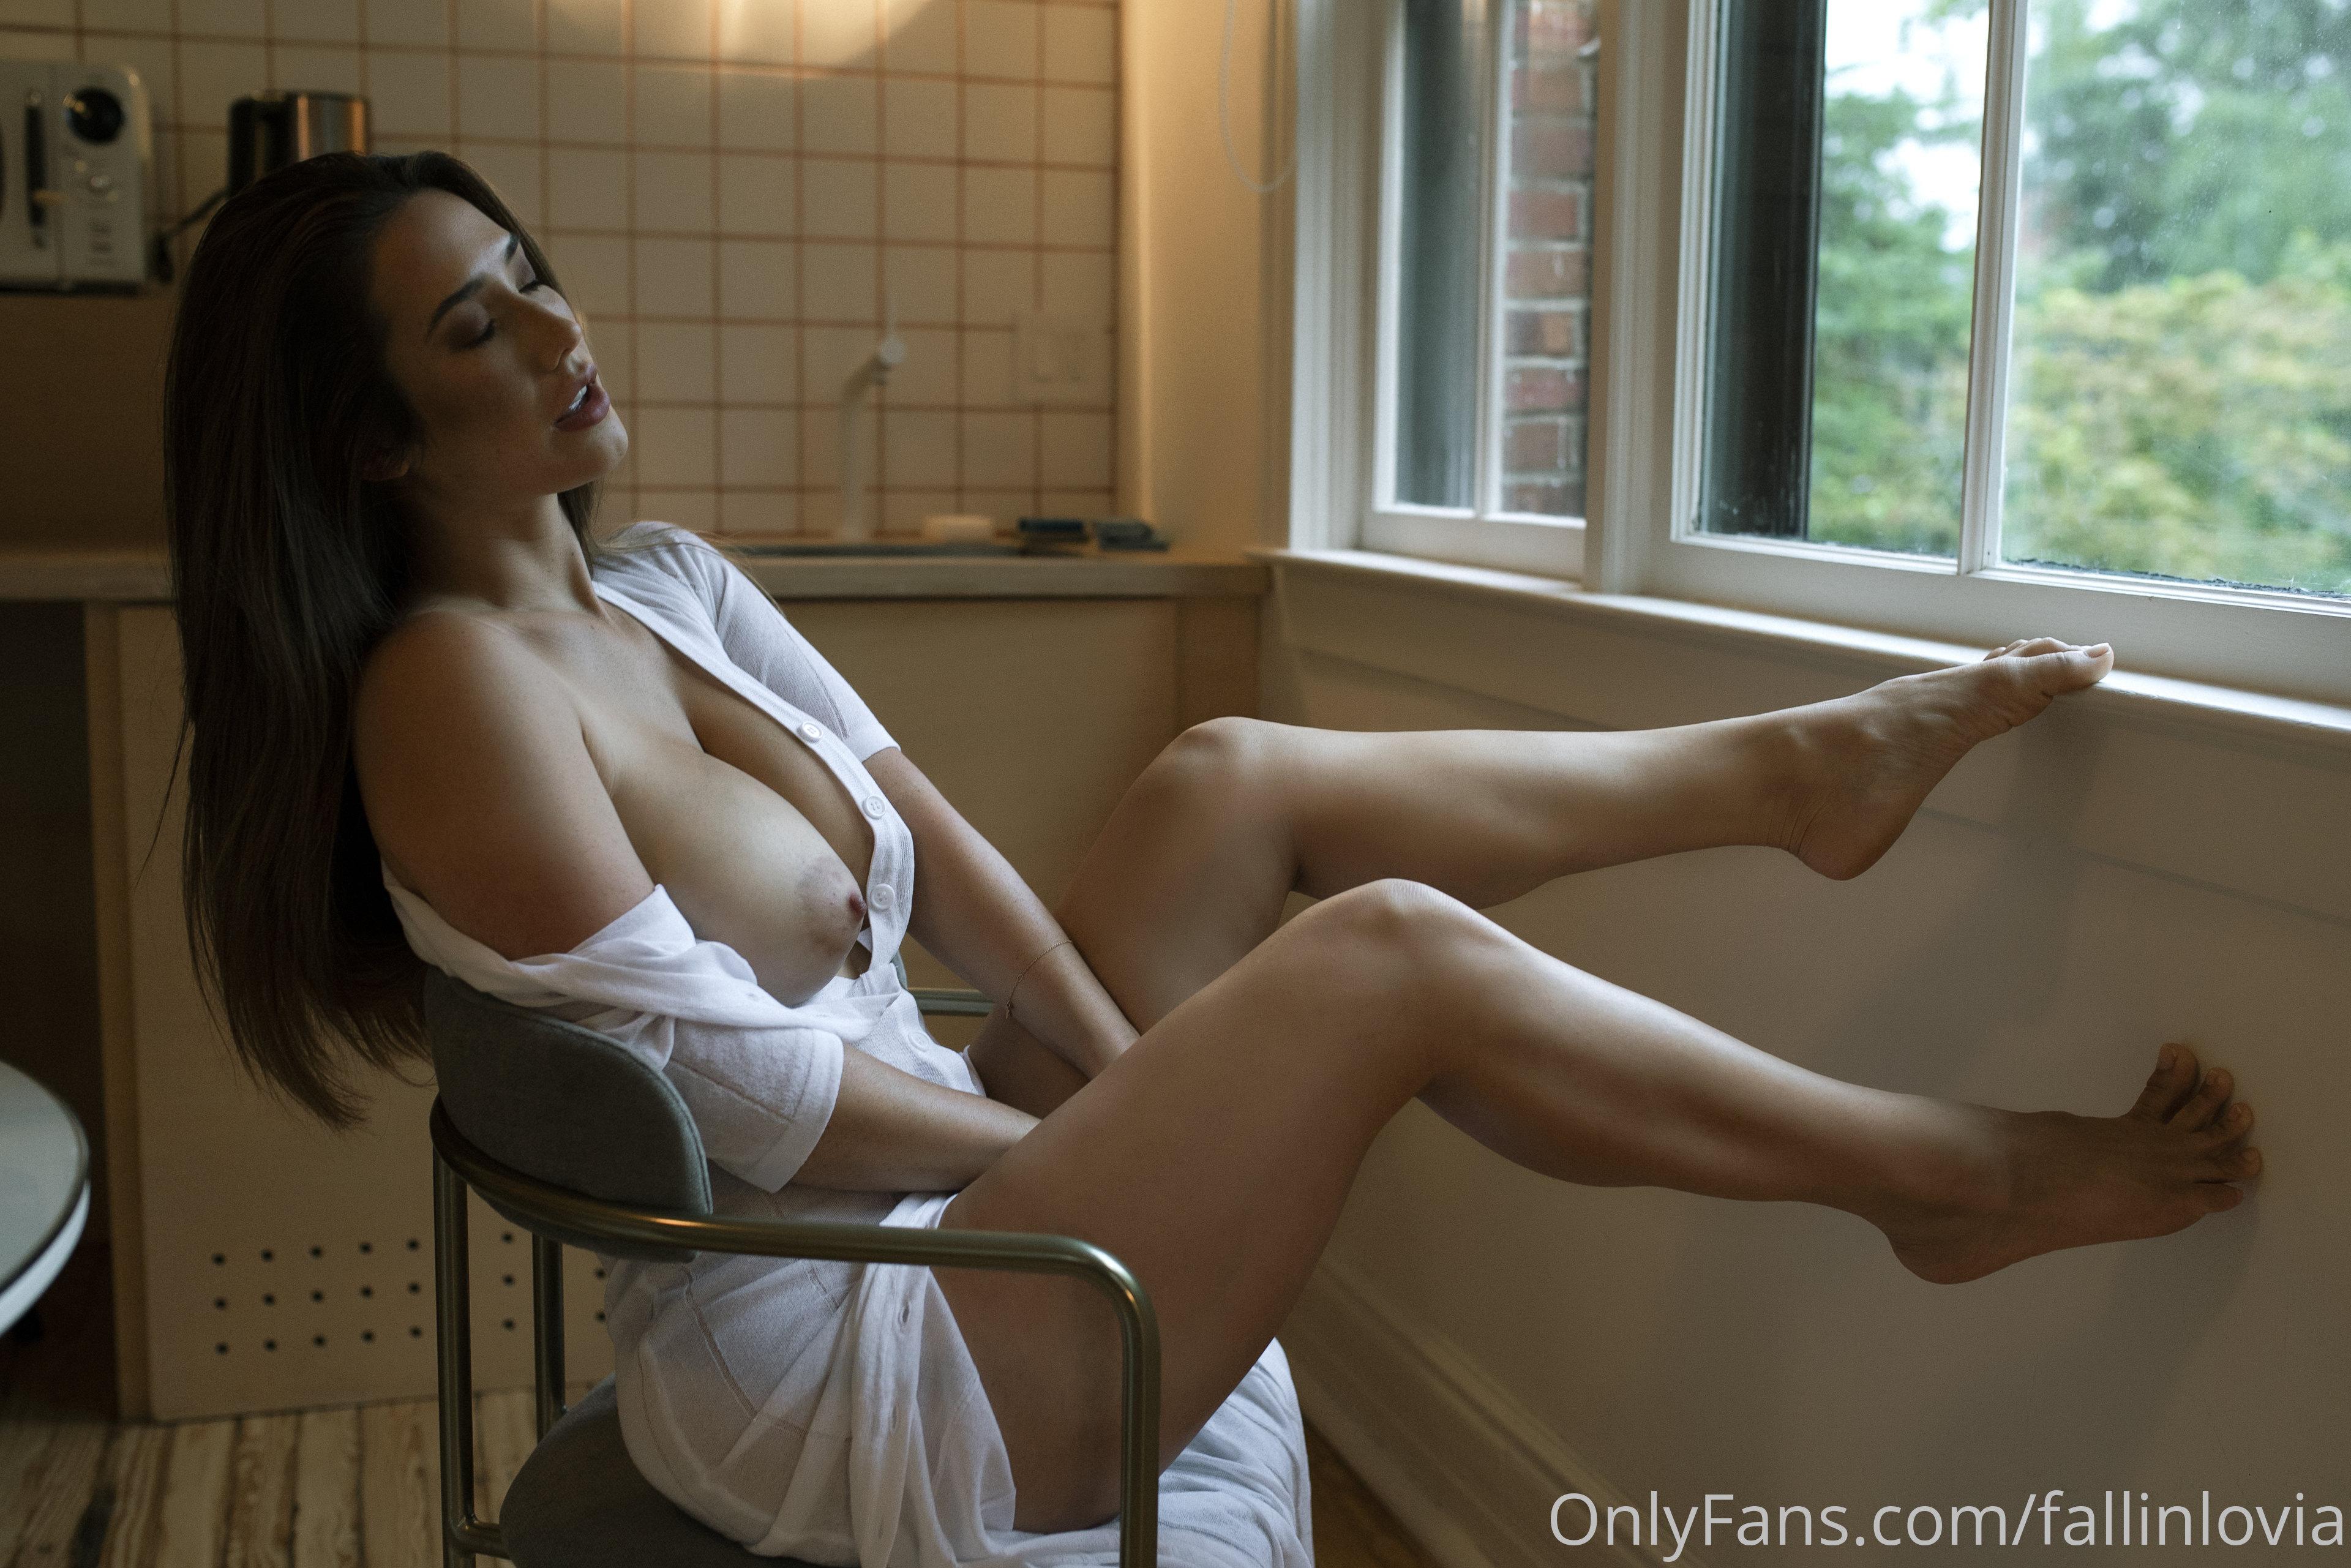 Eva Lovia, Fallinlovia, Onlyfans 0207